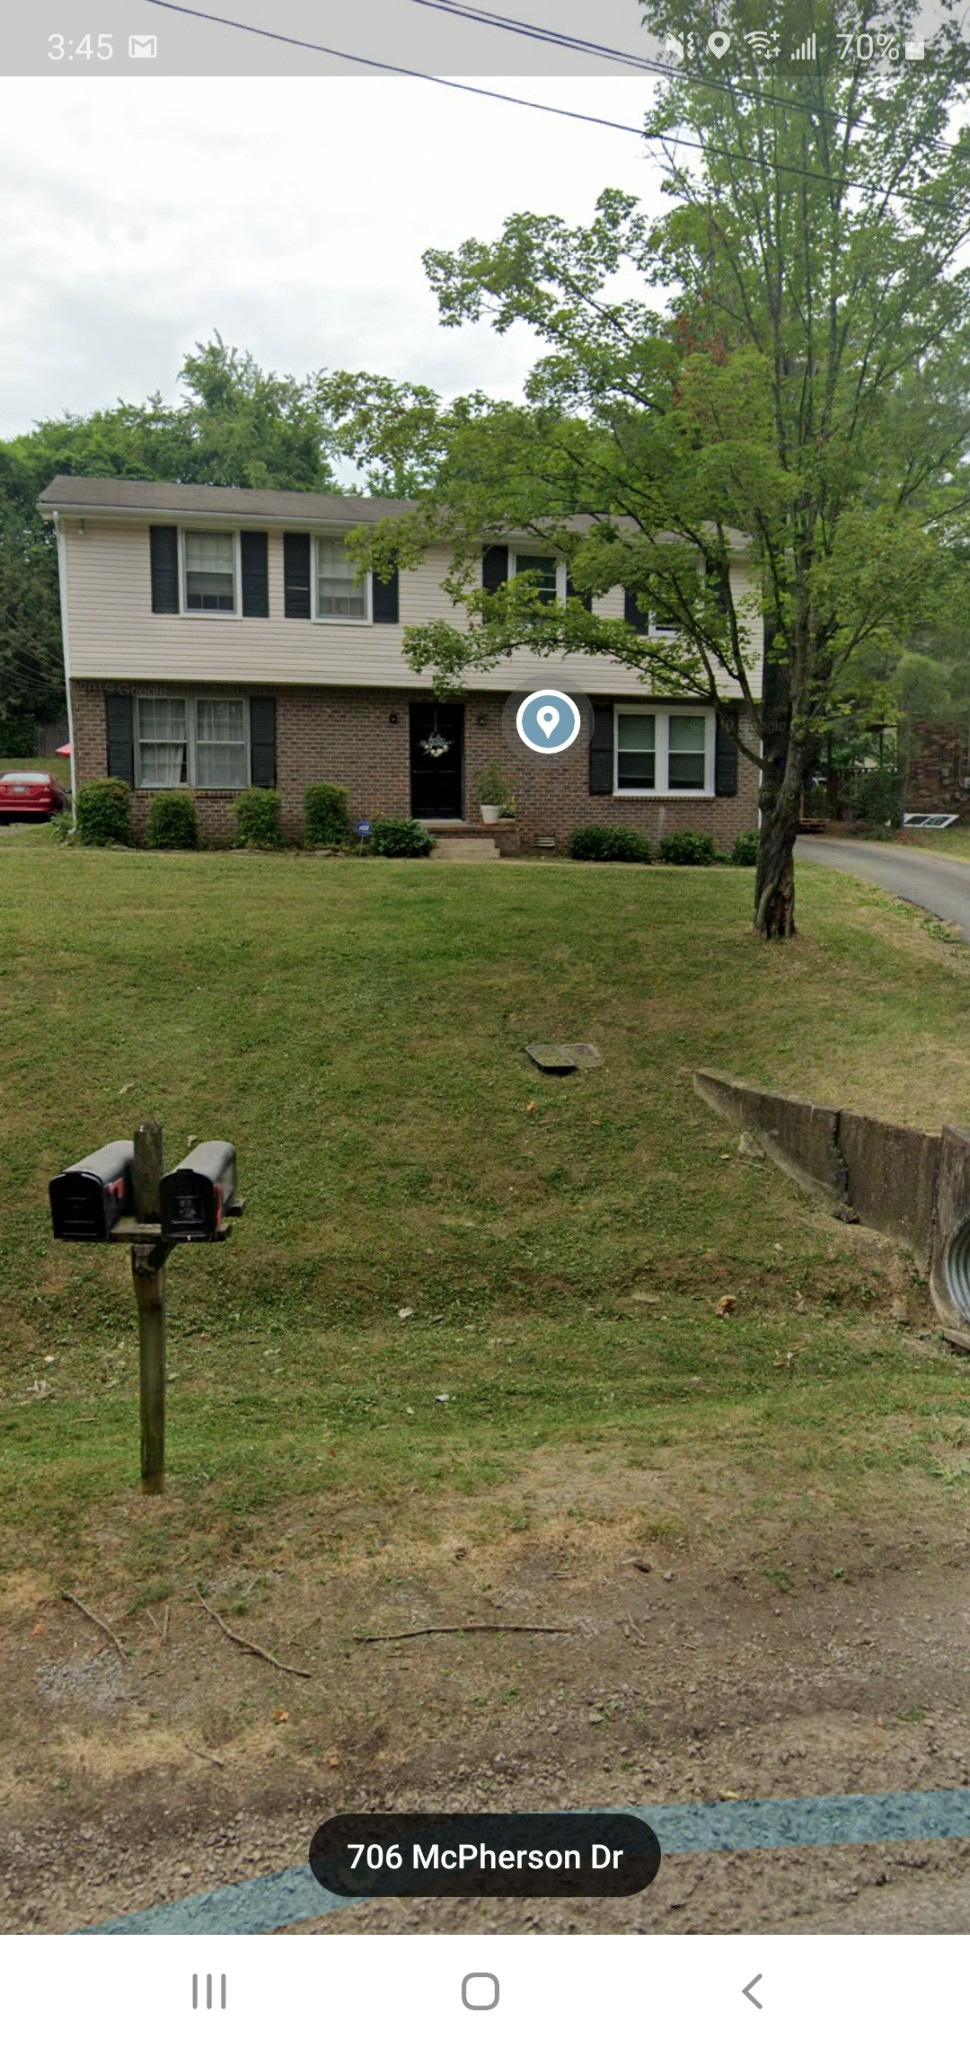 737 McPherson Dr Property Photo - Nashville, TN real estate listing